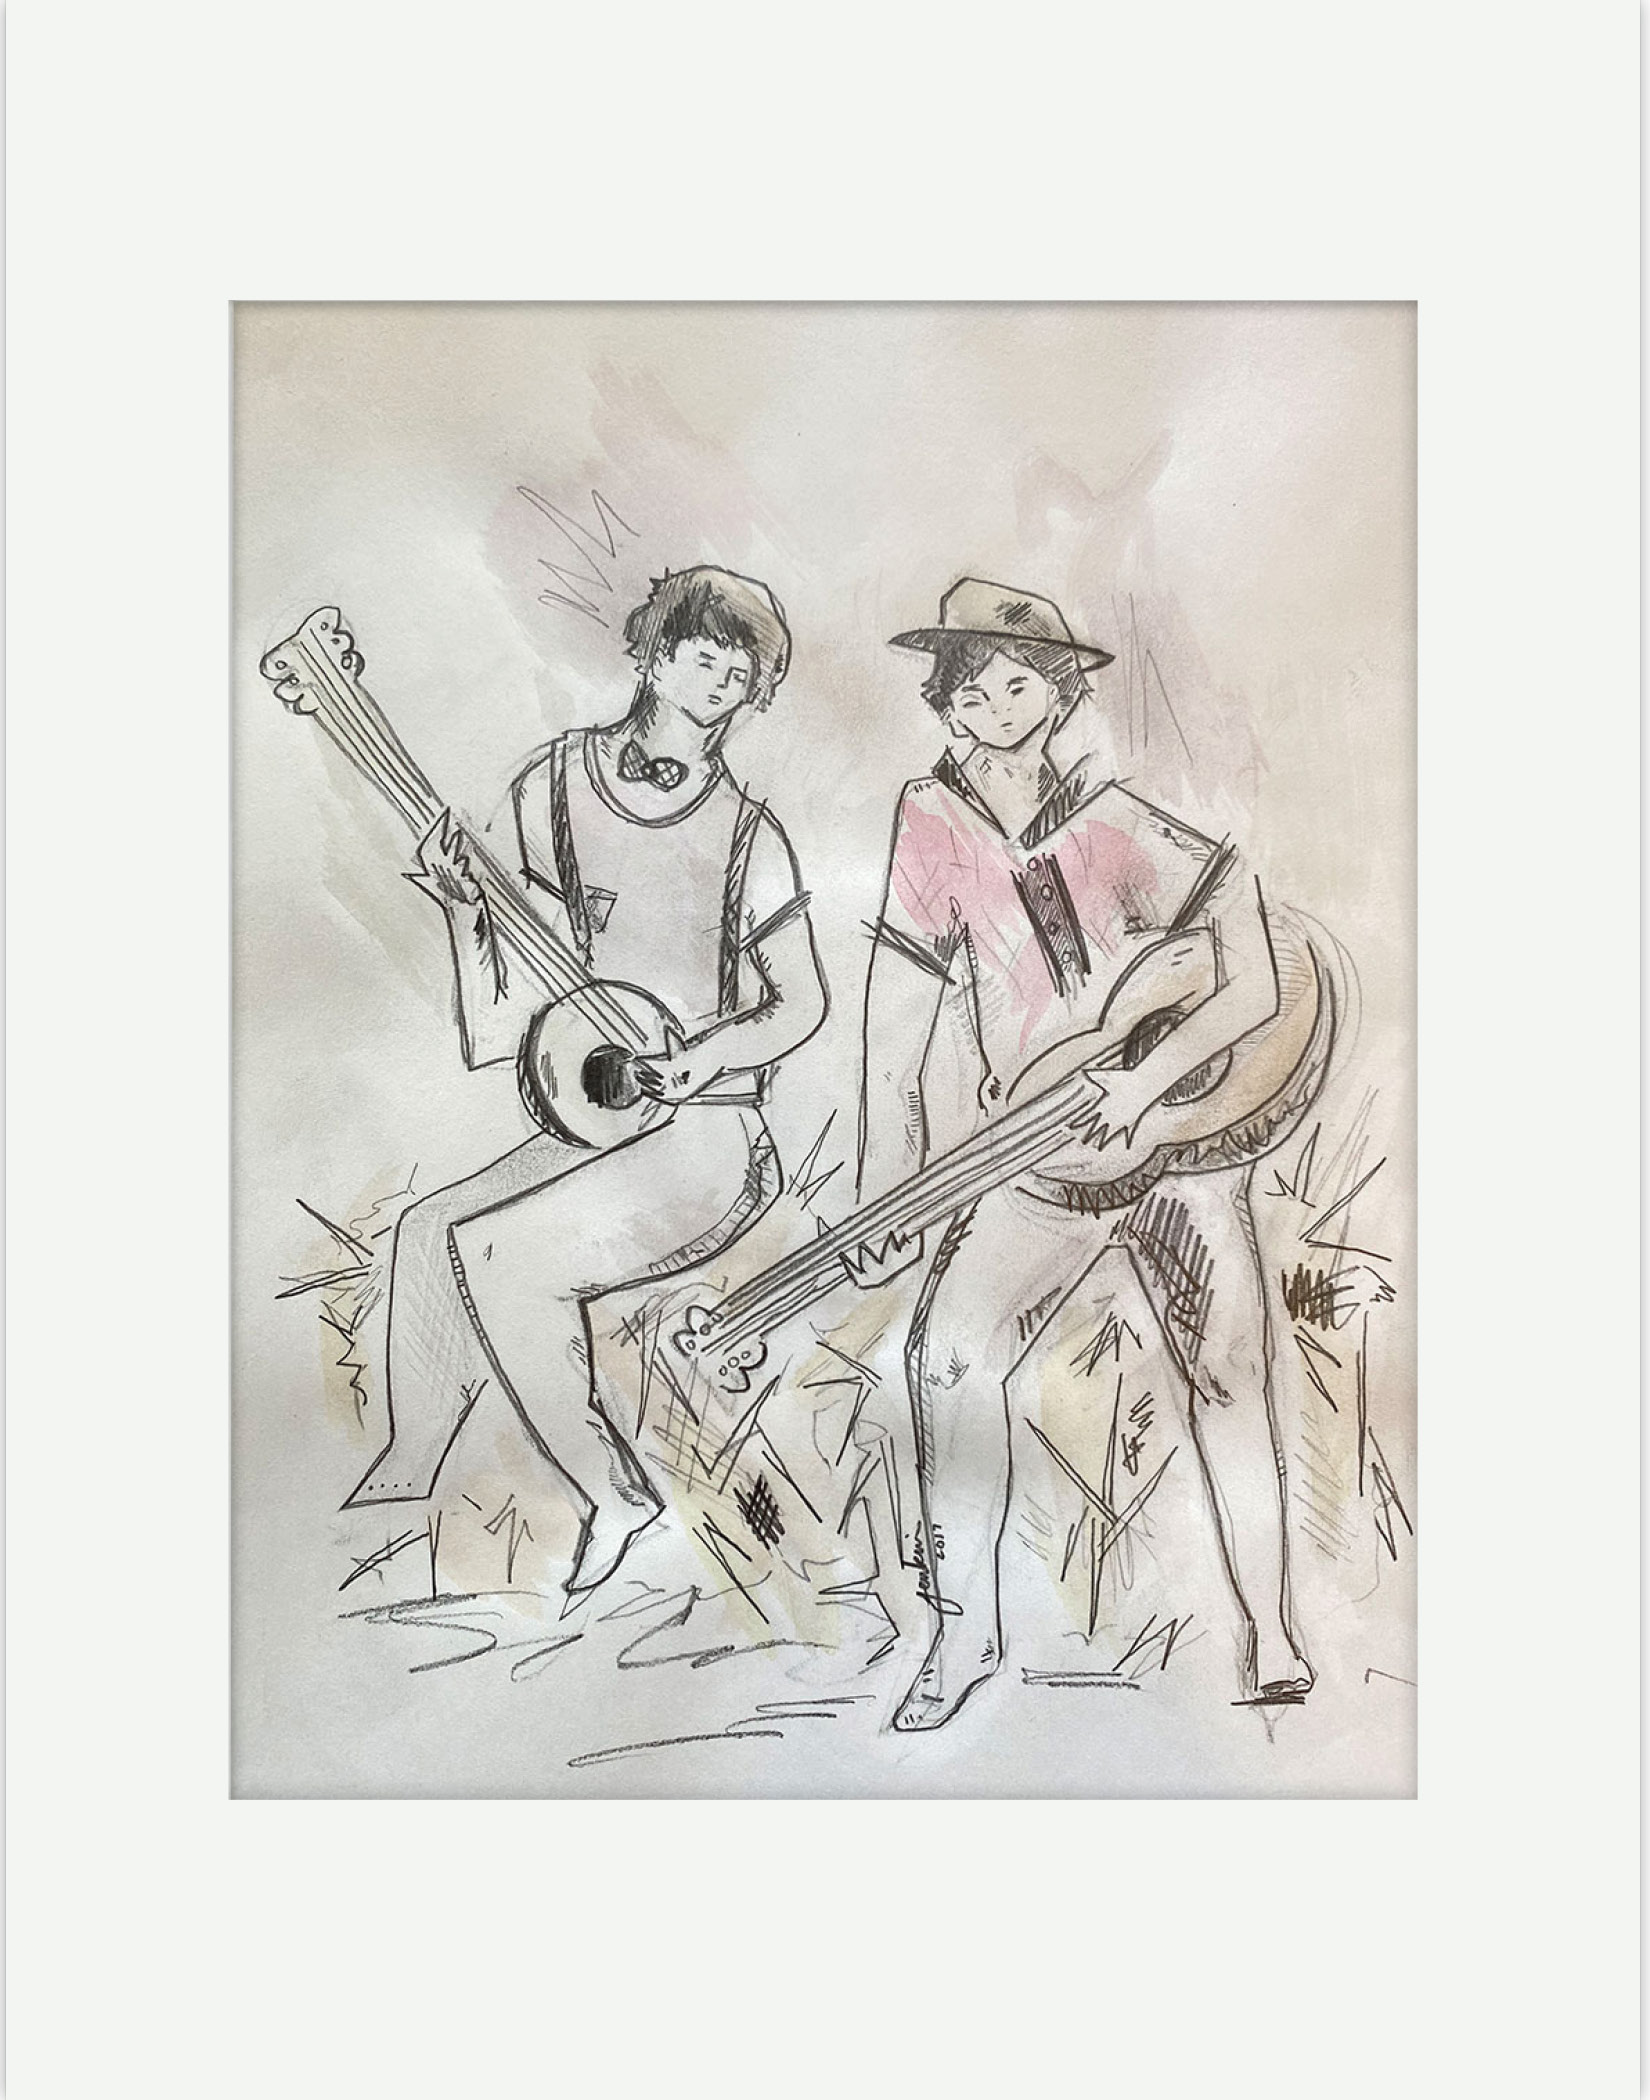 Banjo Players Sitting On Hay Stack